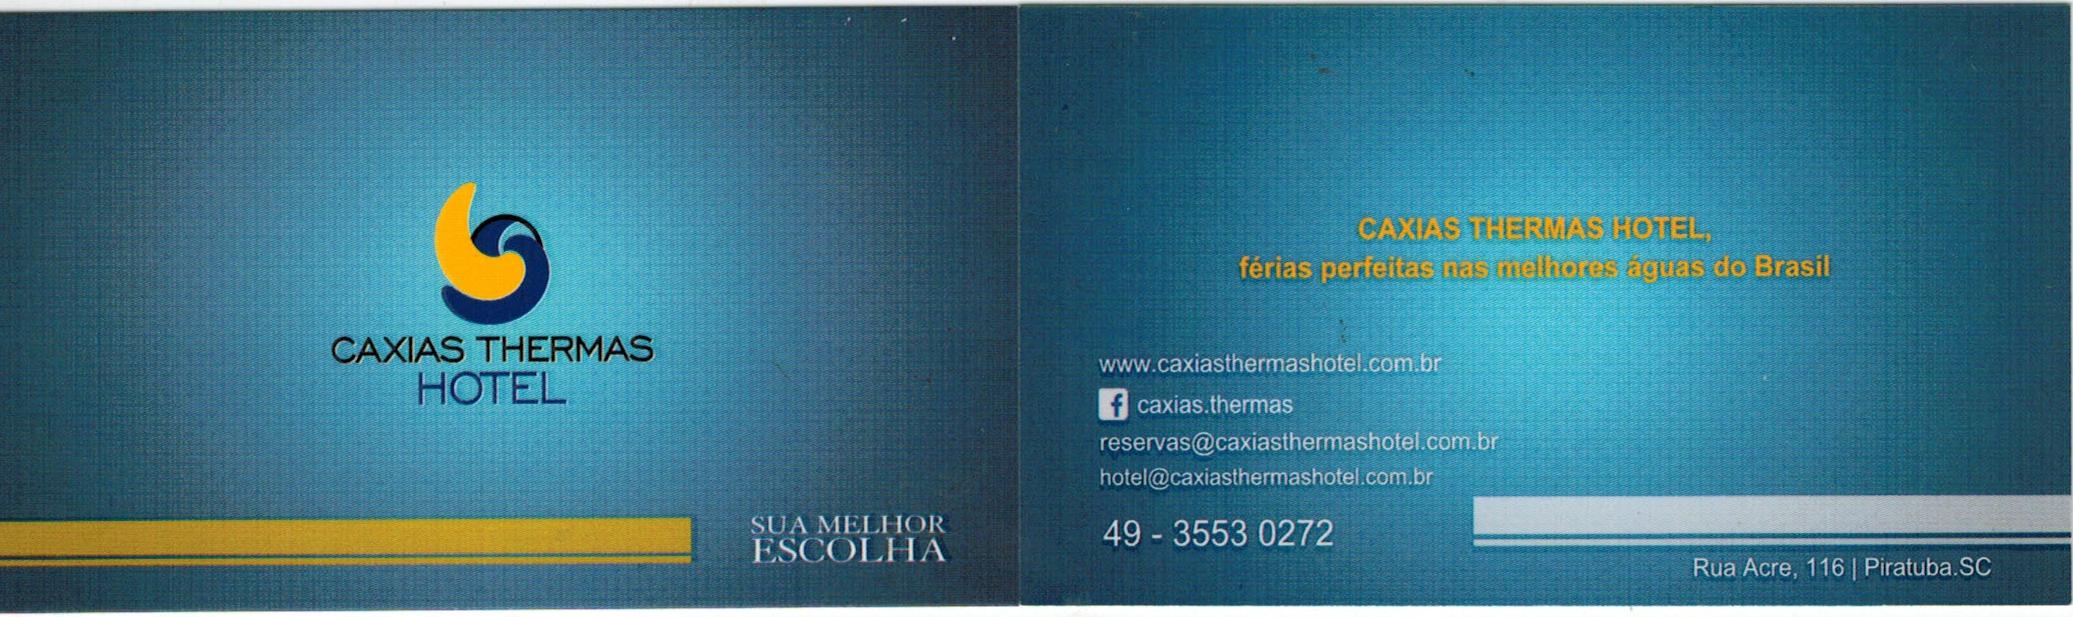 caixias thermas hotel